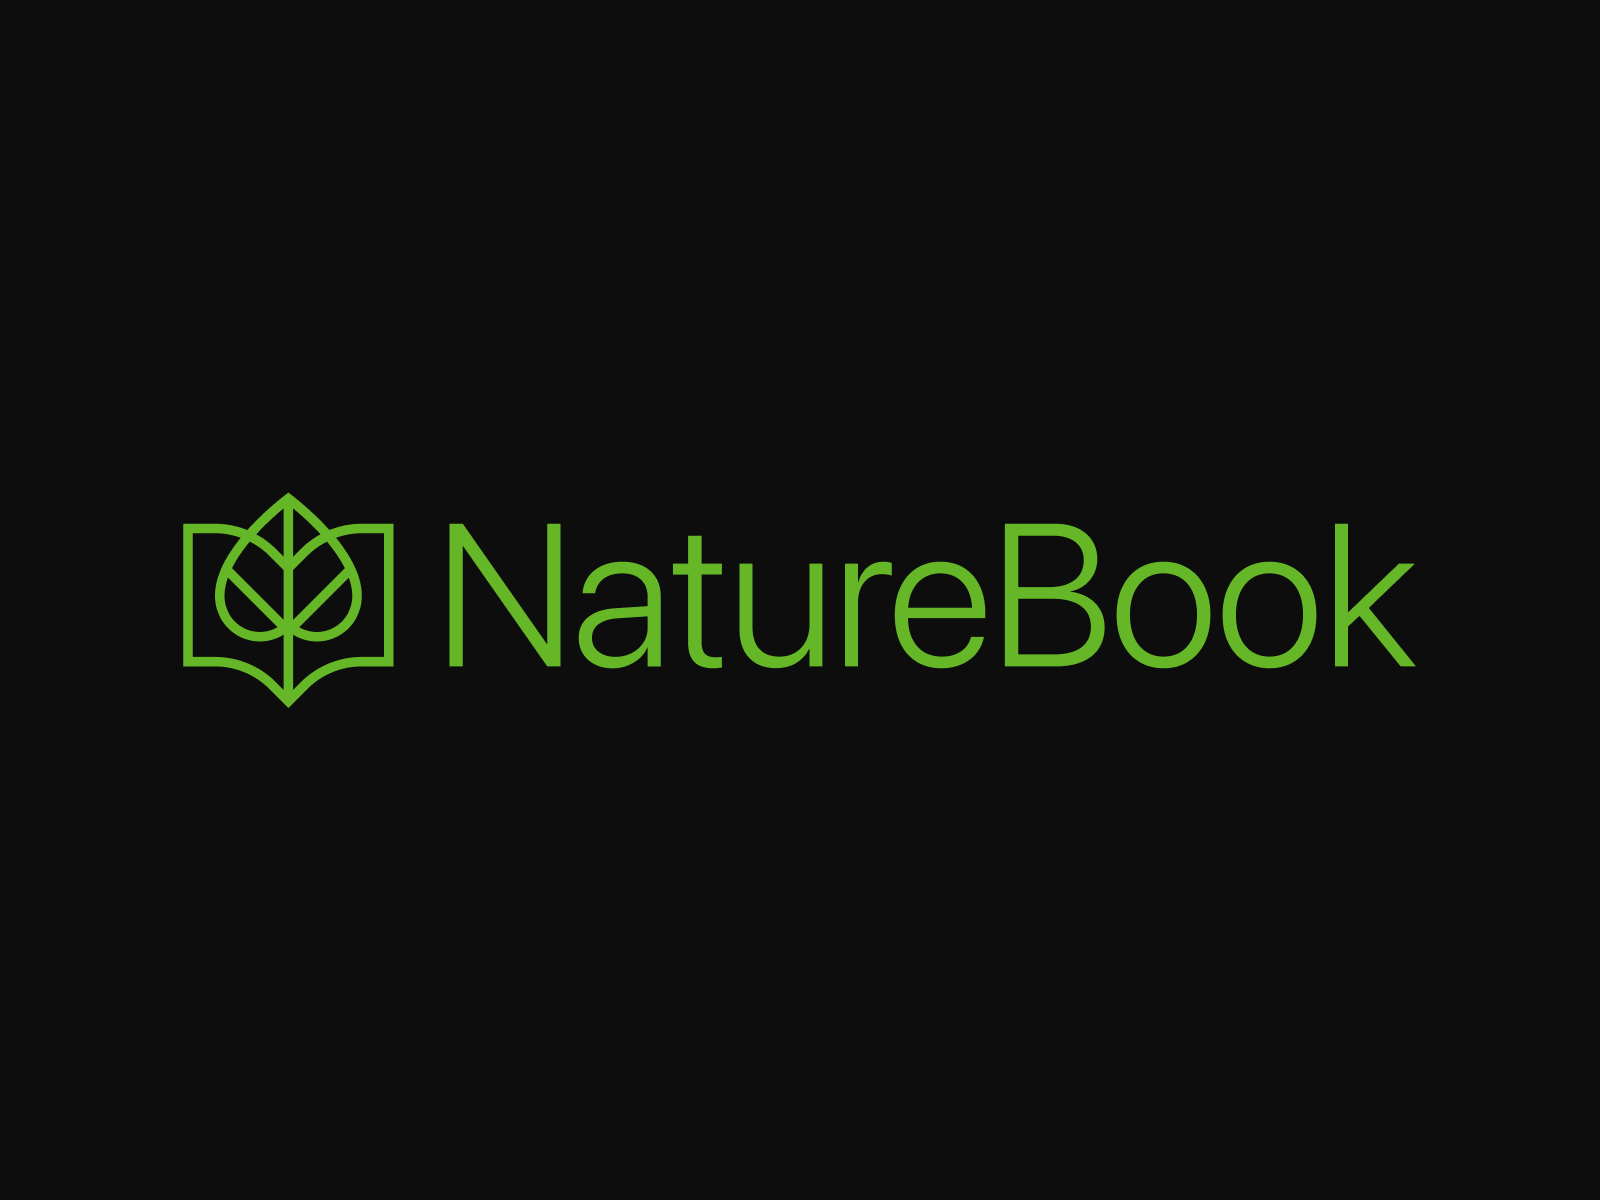 Nature Book Logo Design